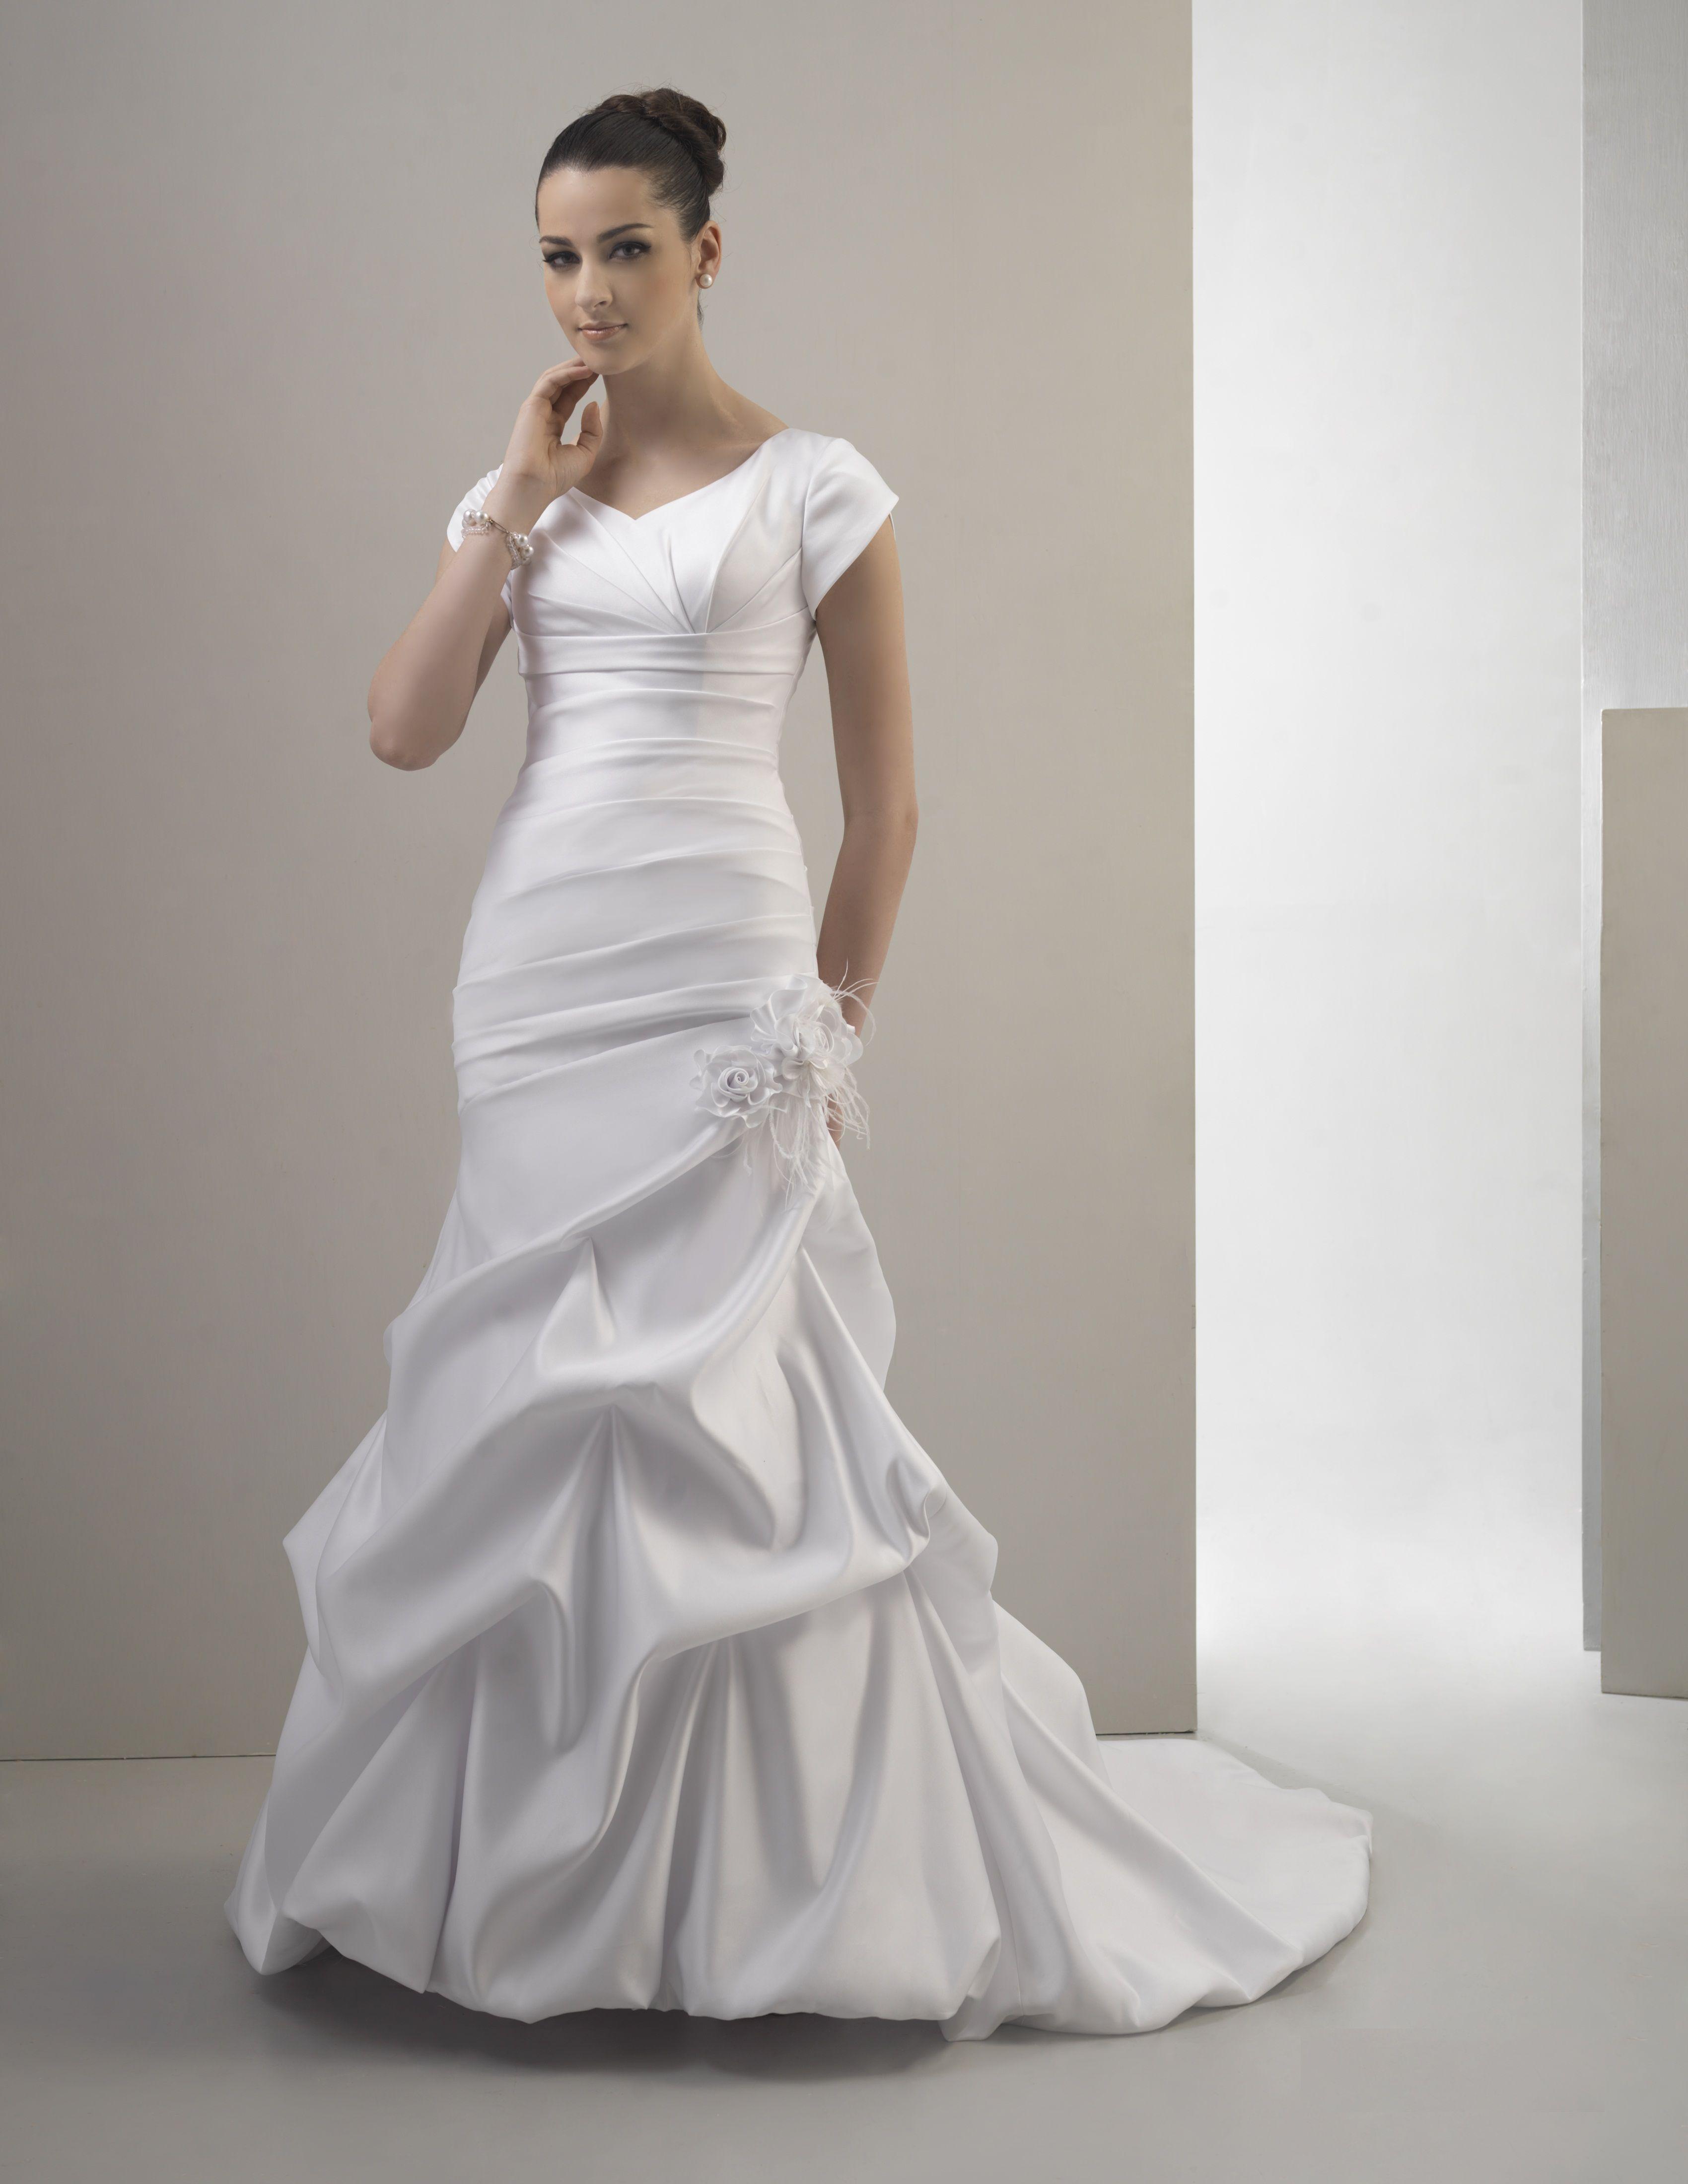 3DLCKN Modest wedding dresses, Wedding dresses unique